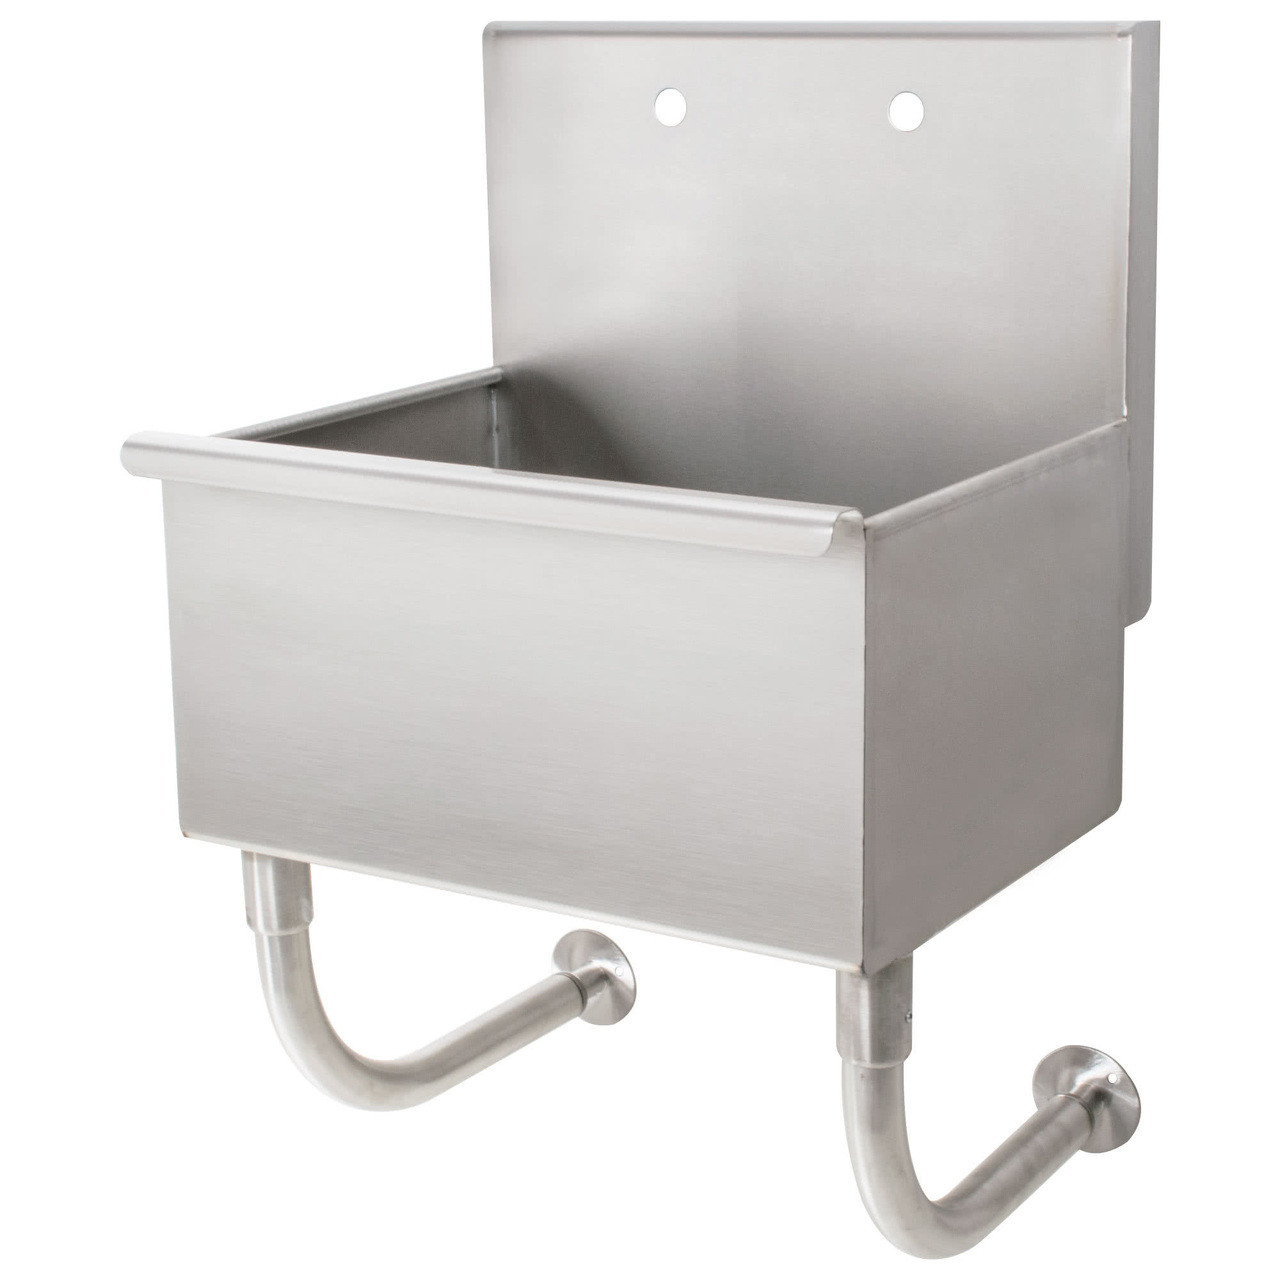 Wall Mounted Utility Sink